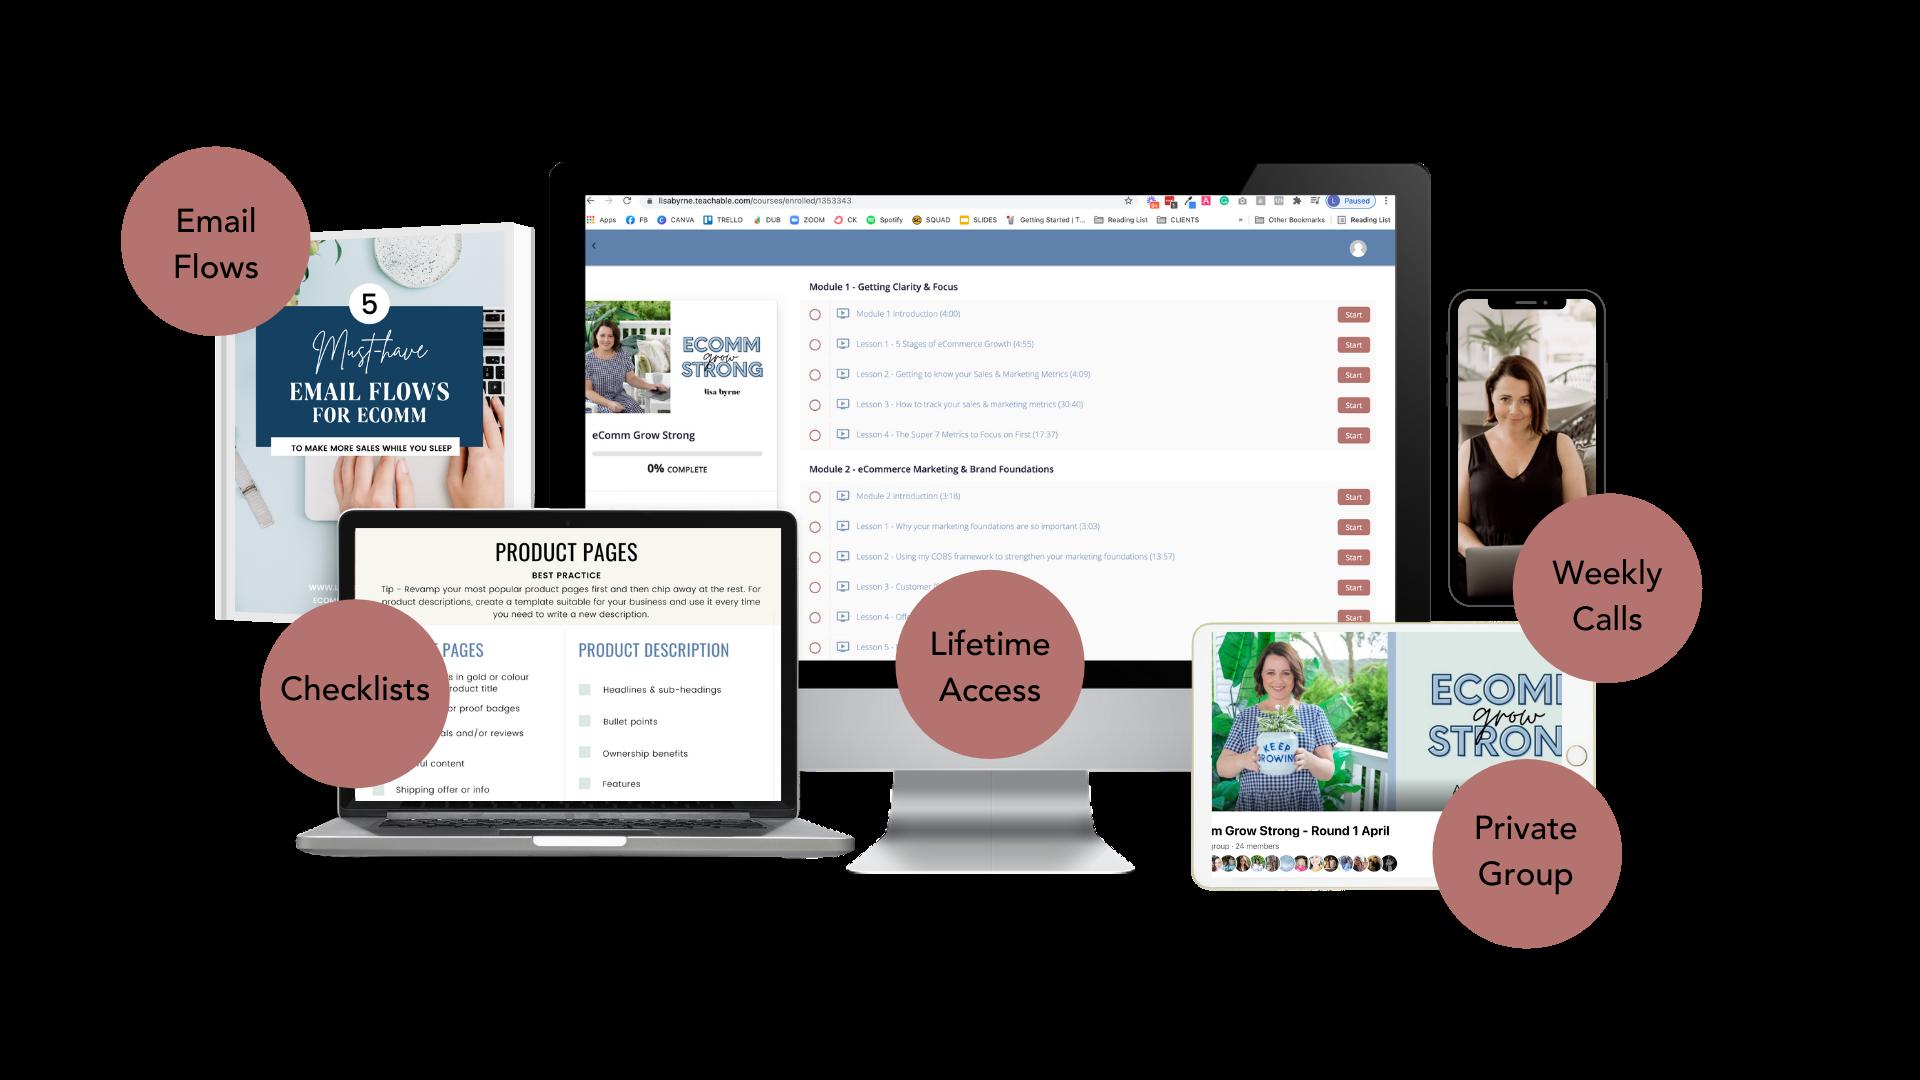 marketing coach, ecommerce, ecommerce strategy, marketing strategy, ecommerce business, online course, female founder, online store, marketing, coaching, business coach, marketing plan, mentor